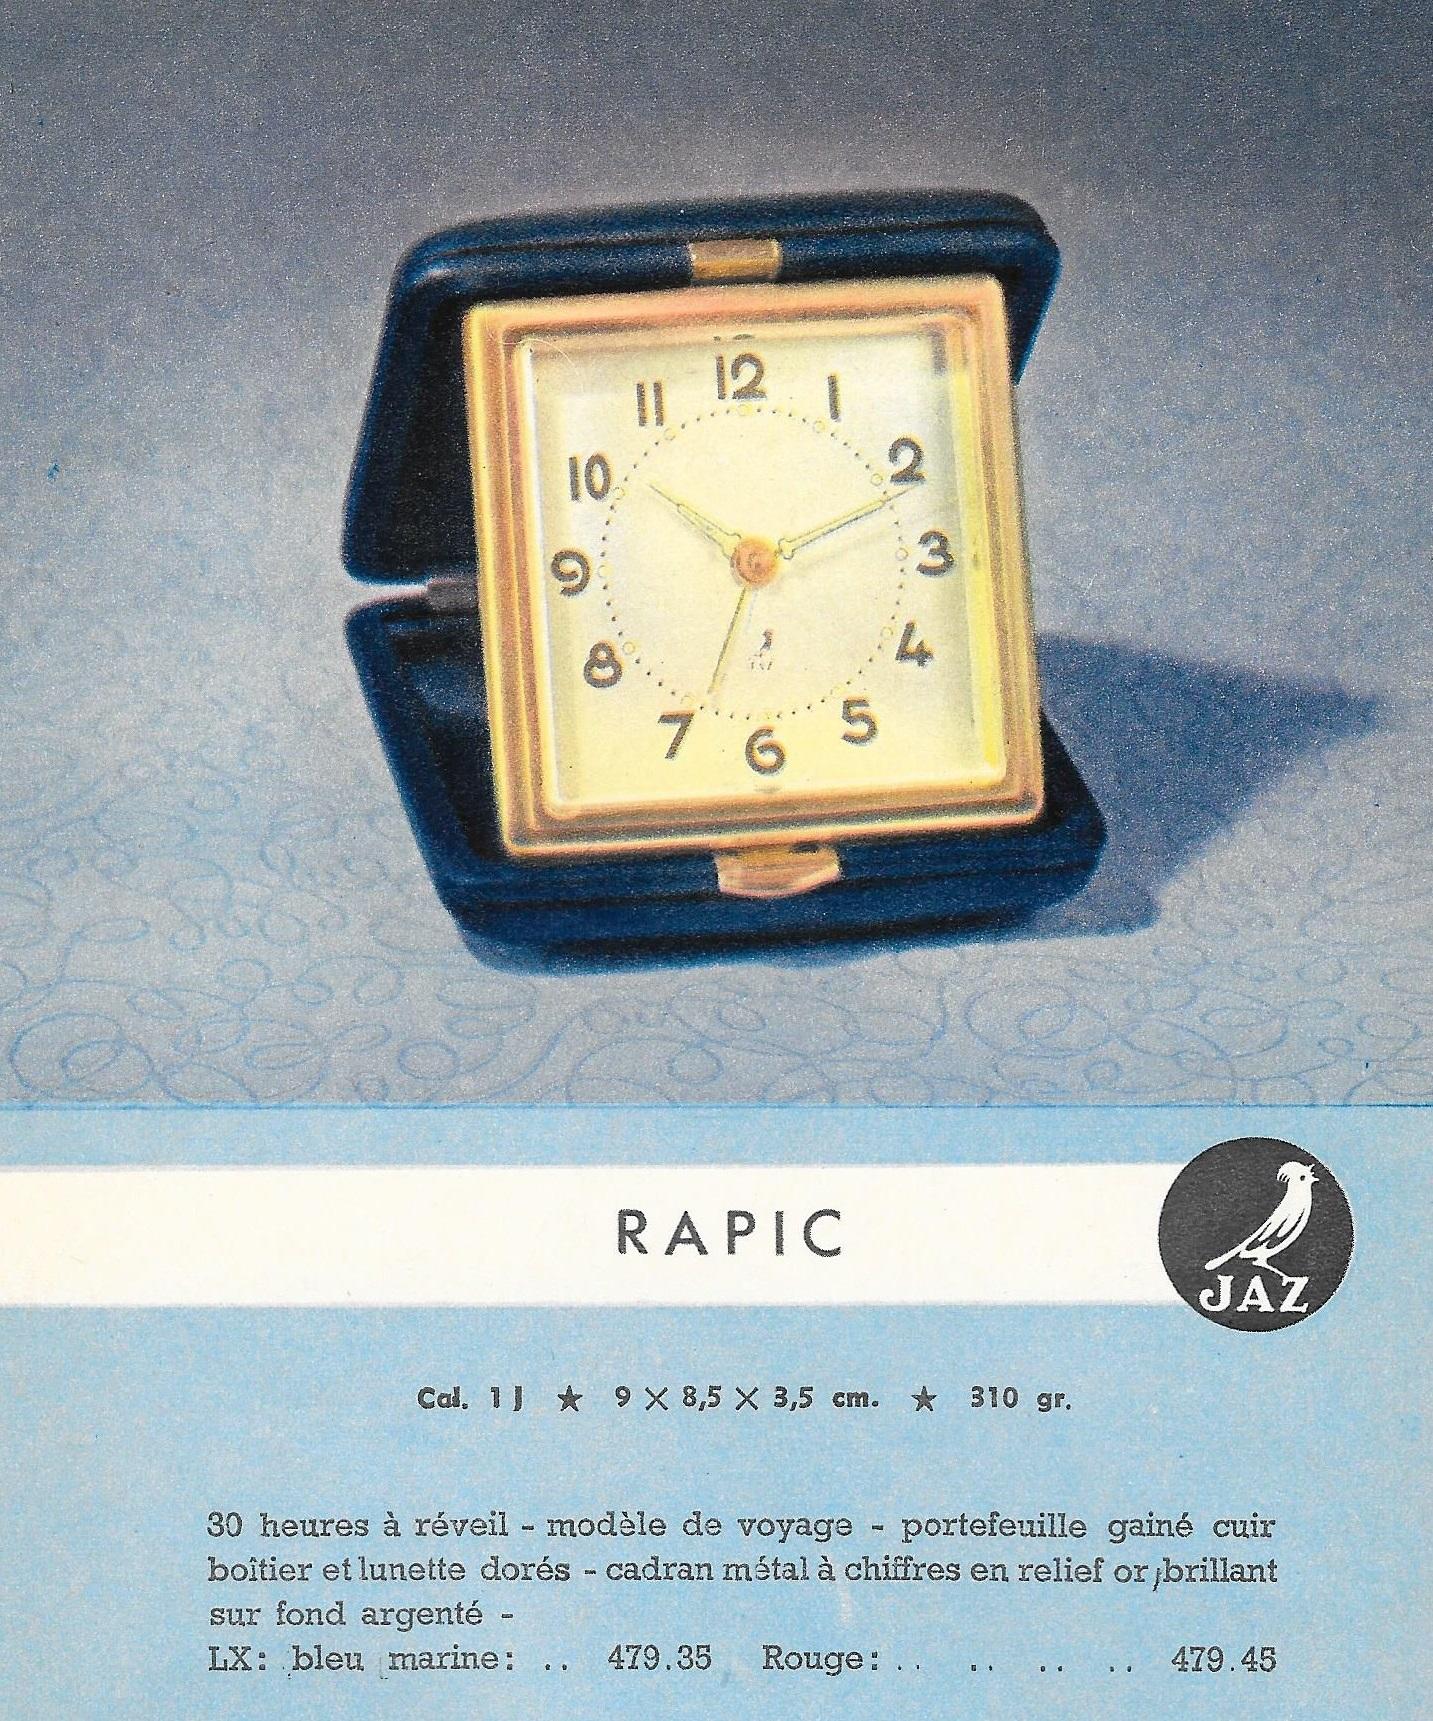 rapic 2 catalogue belge 1950